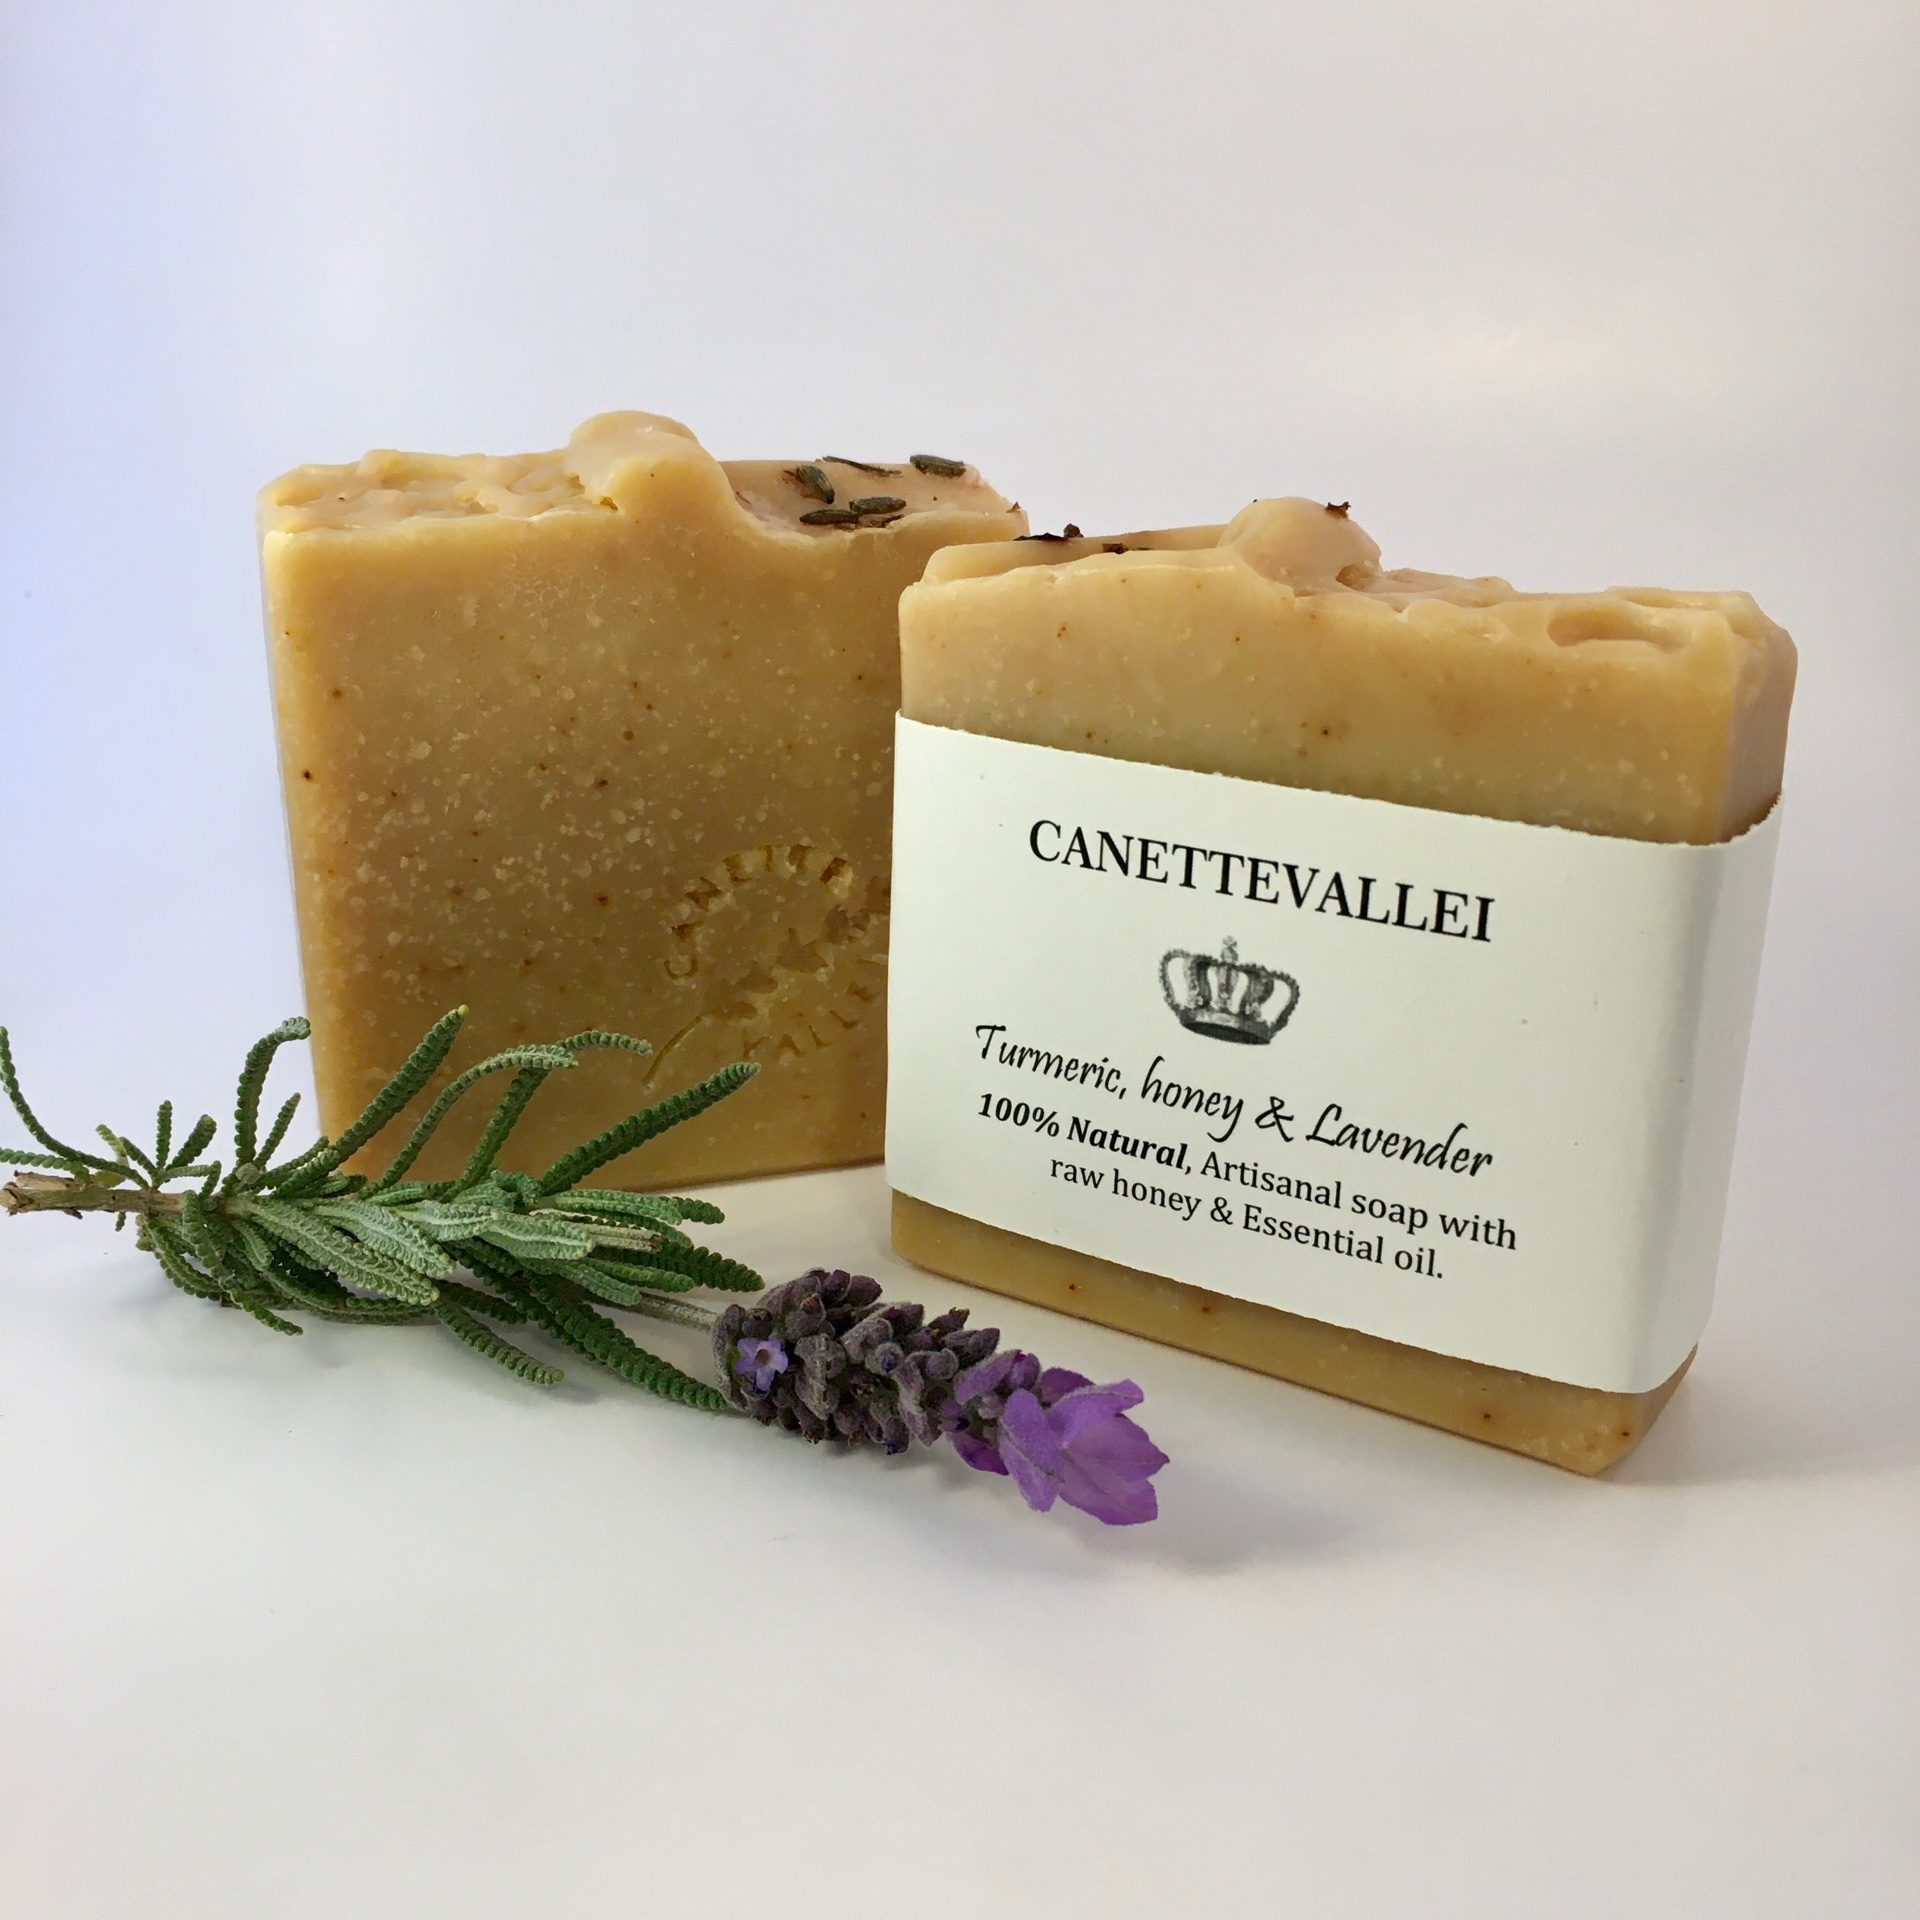 Turmeric, Honey & Lavender